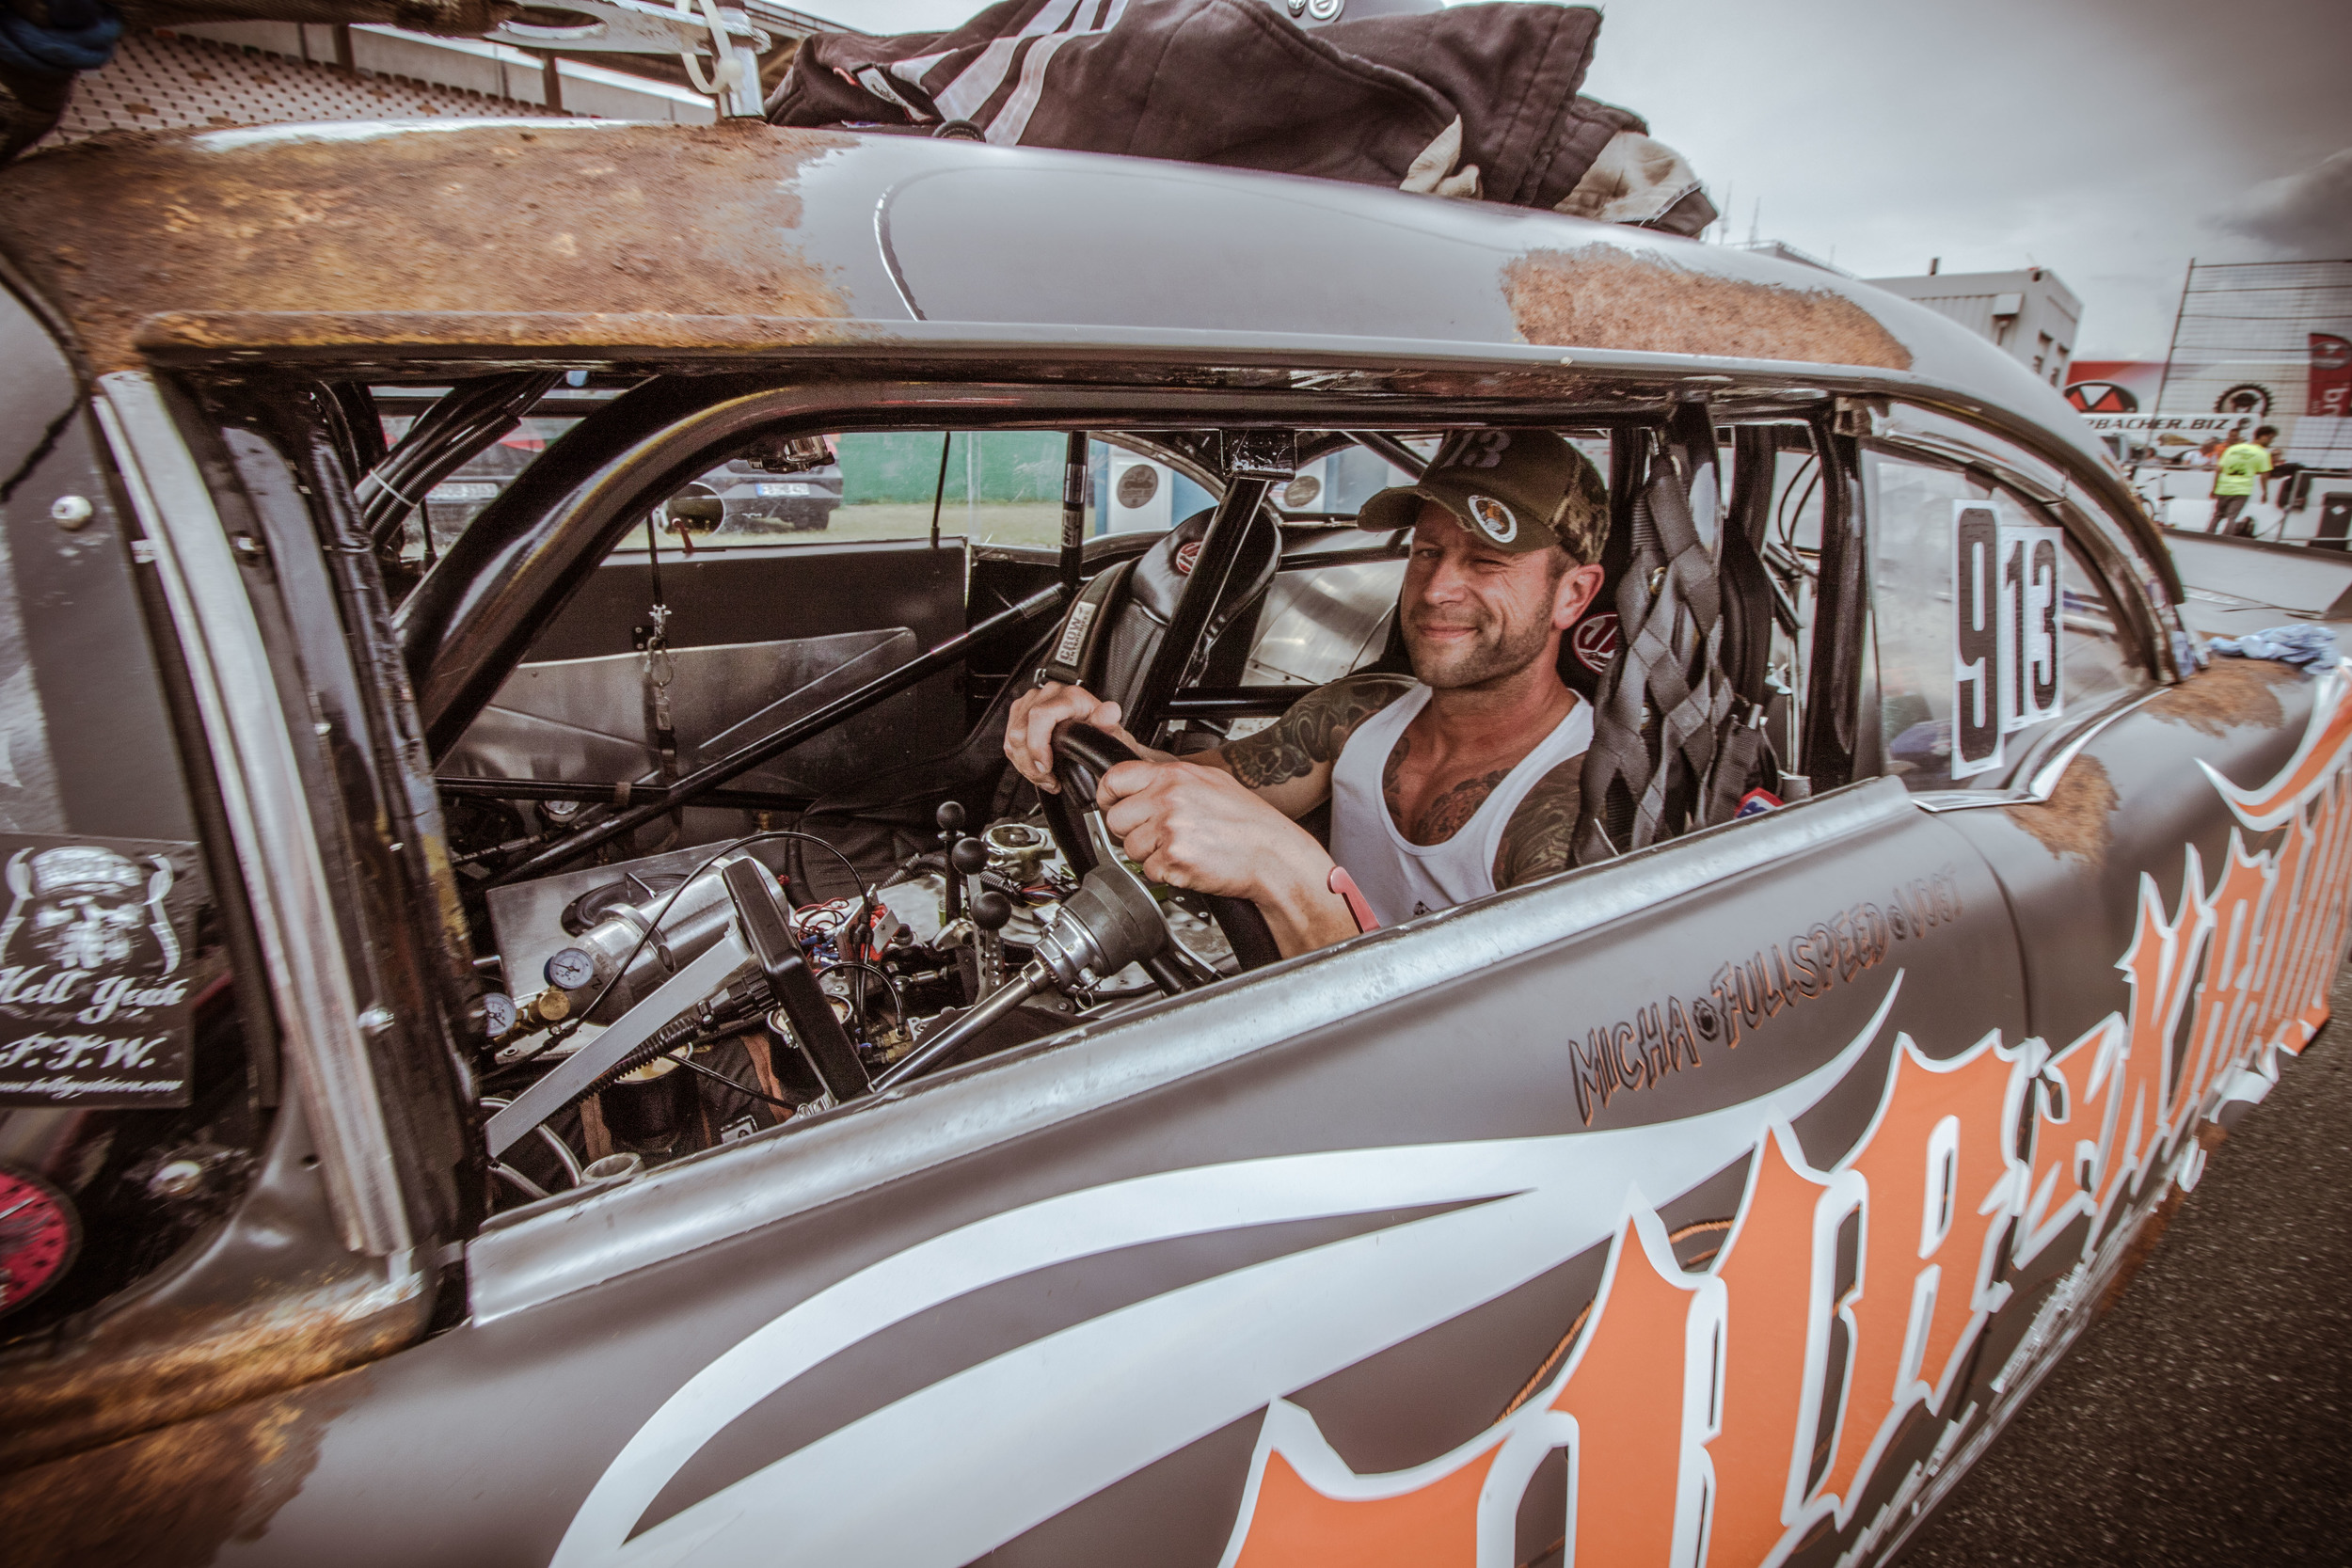 Race Antz NitrolympX 2016 by Dirk Behlau-1414.jpg